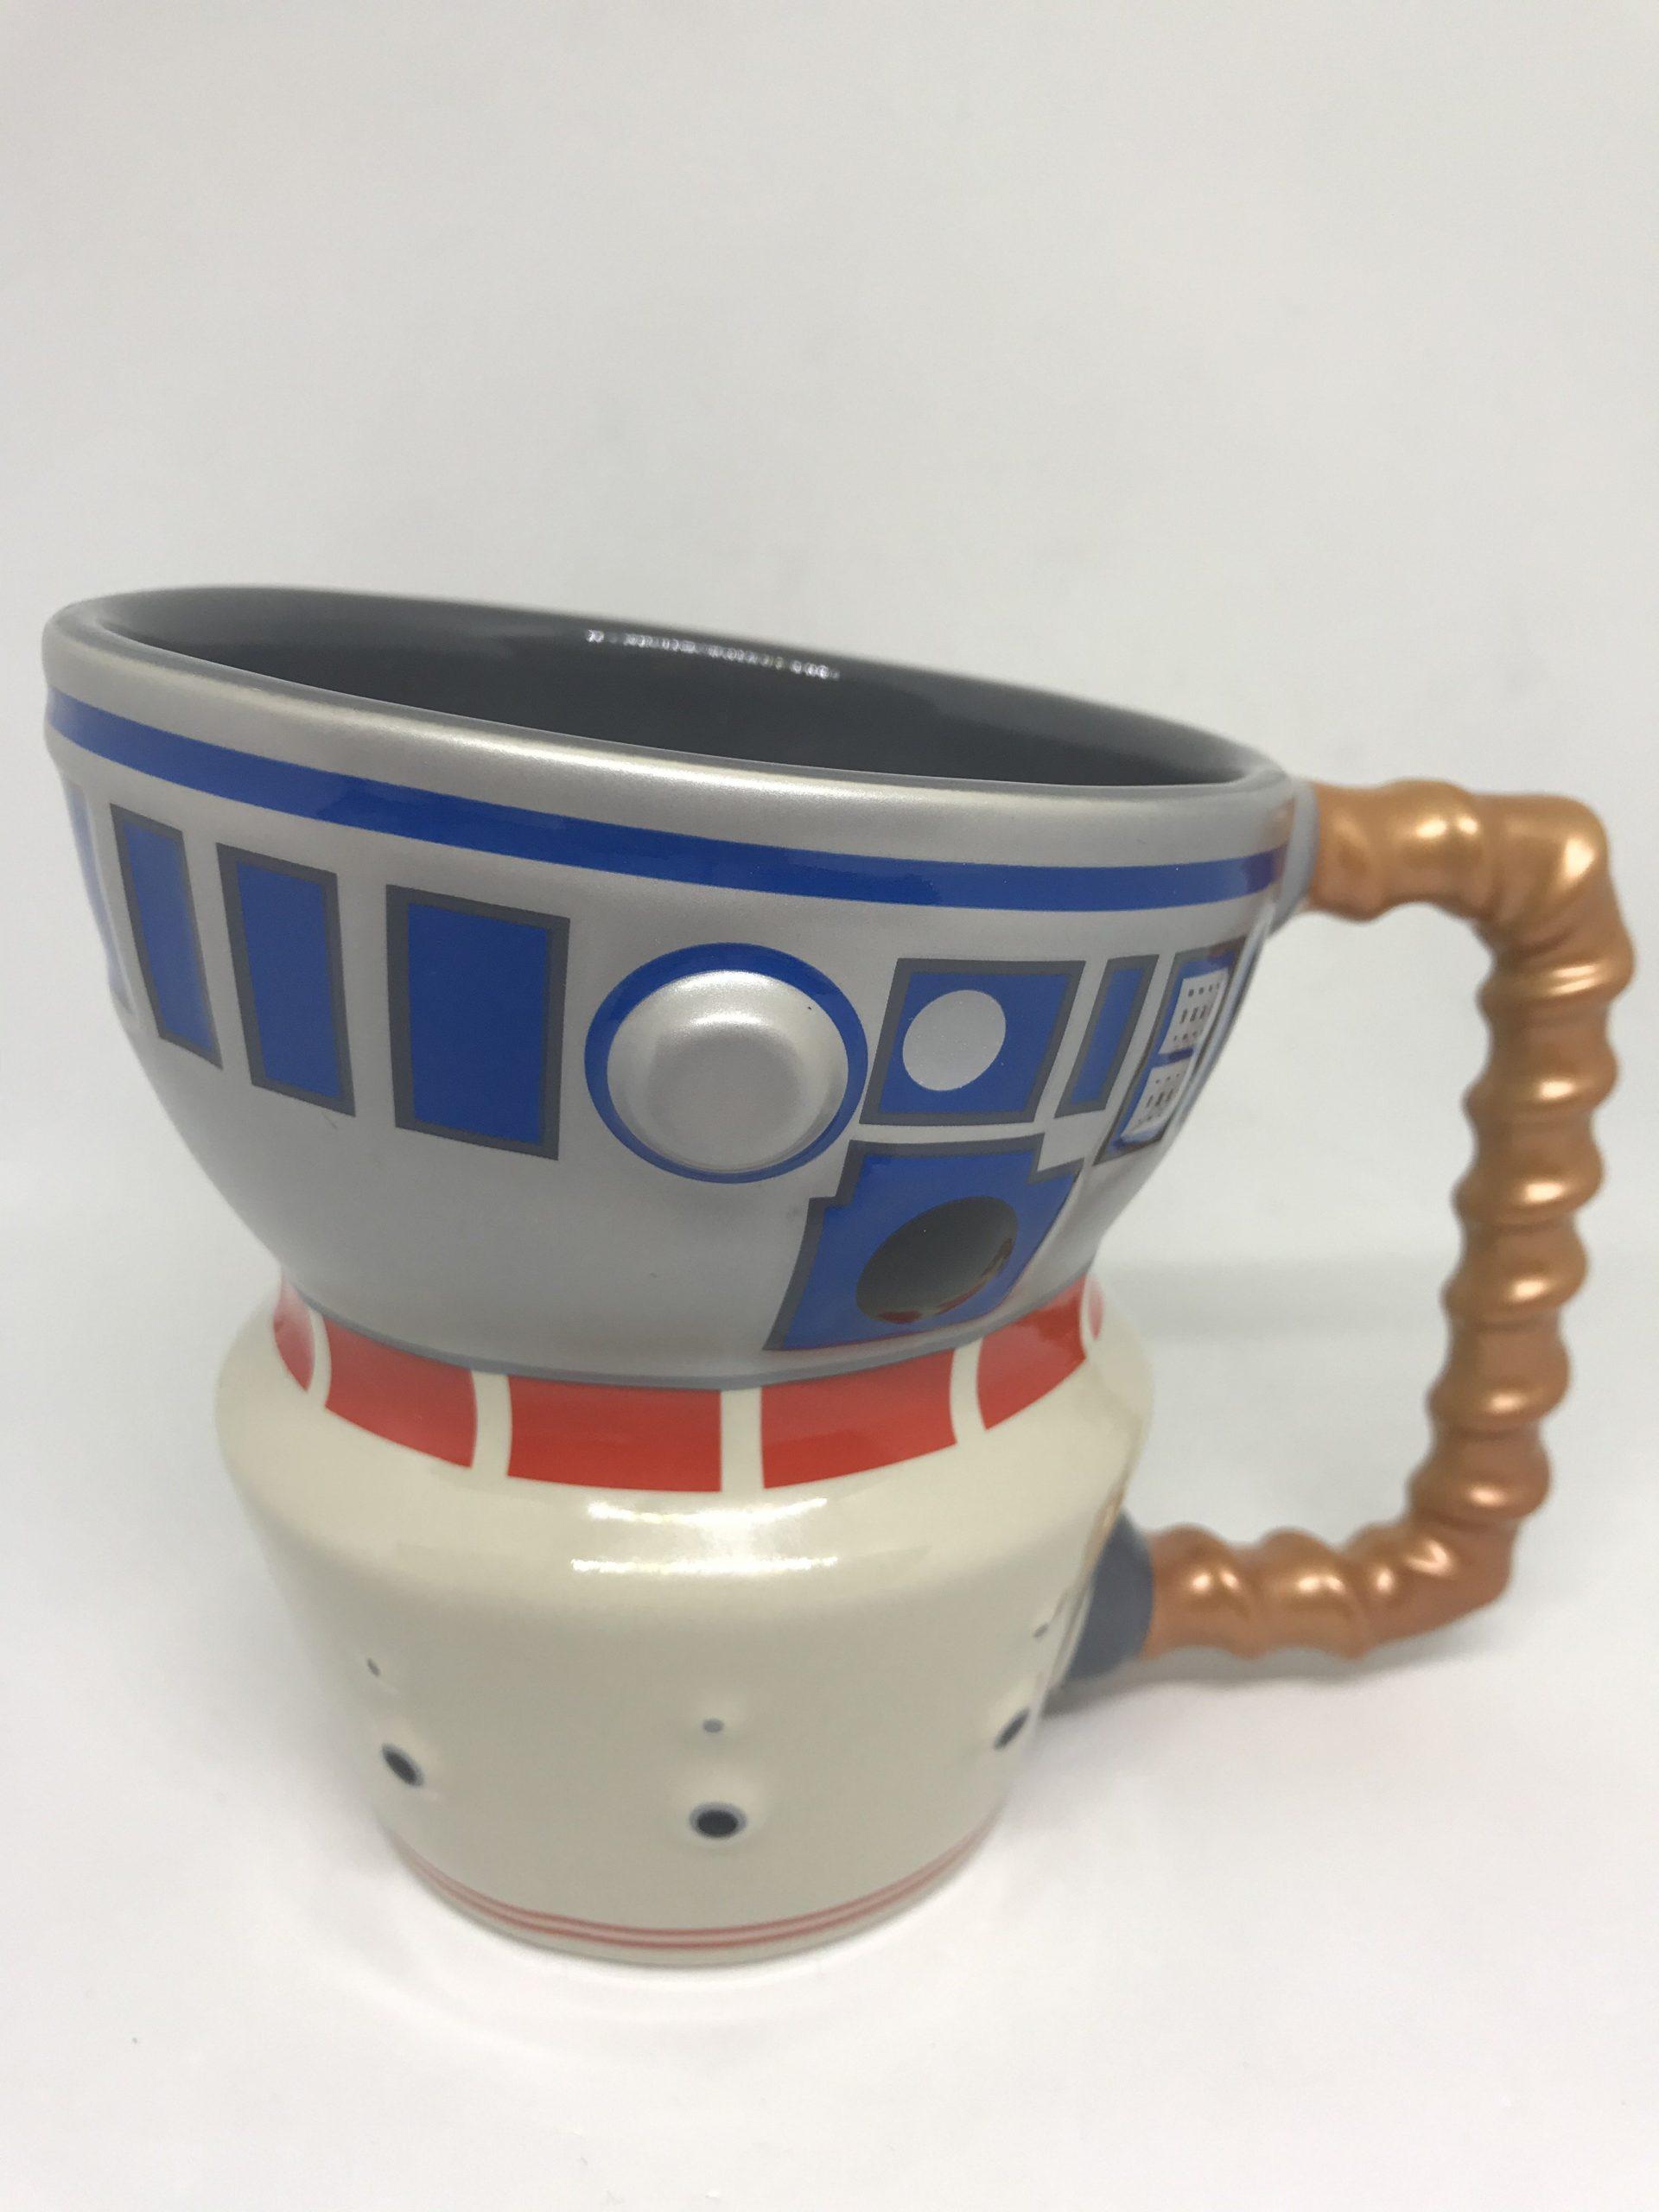 SWGE Droid Depot R2-D2 and R5-D4 Coffee Mug 2